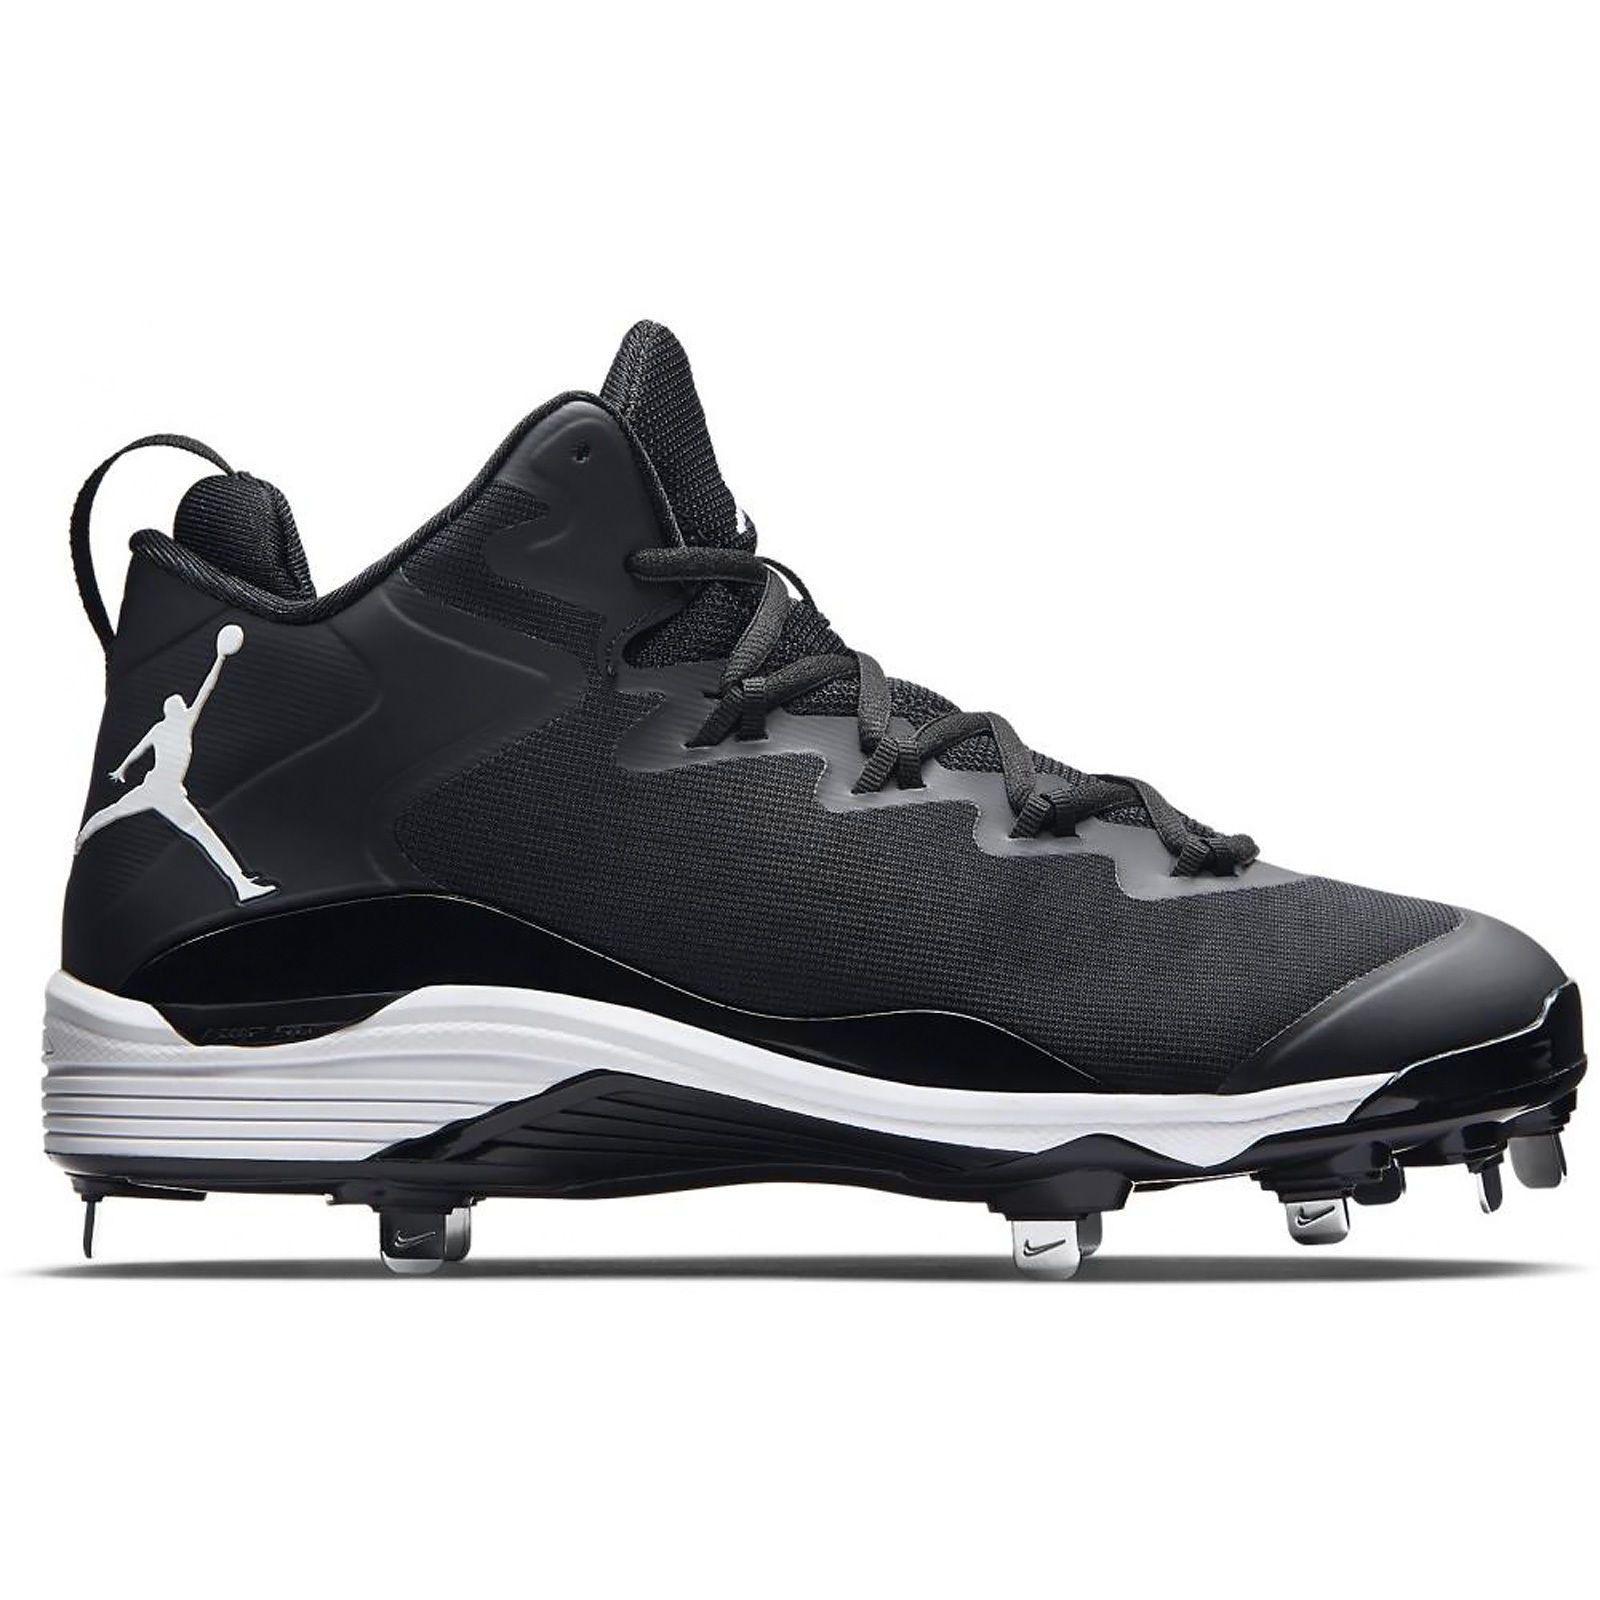 New Nike Air JORDAN Super.Fly 3 Metal Mens Baseball Cleats   Black   Size 13 5f8f24930b7